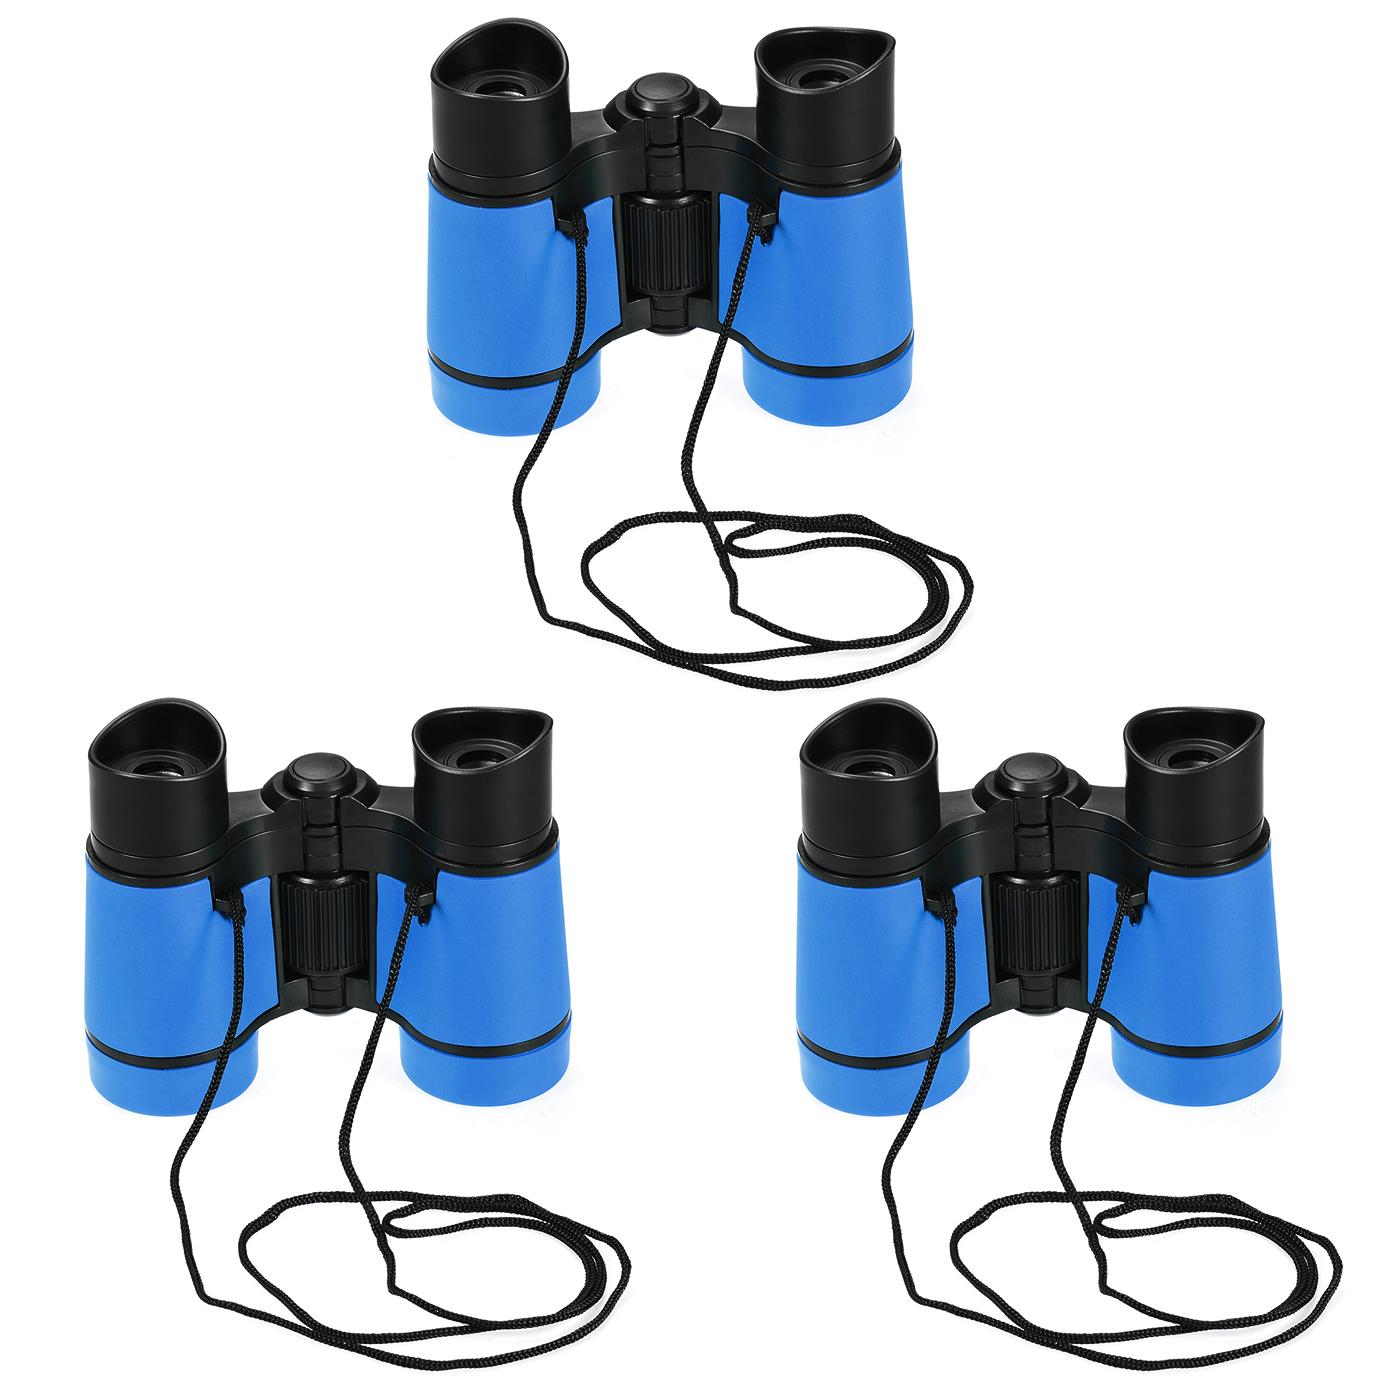 3pcs Toy Binoculars 4X30 Compact Foldable Binoculars Sky Blue with Neck Strap